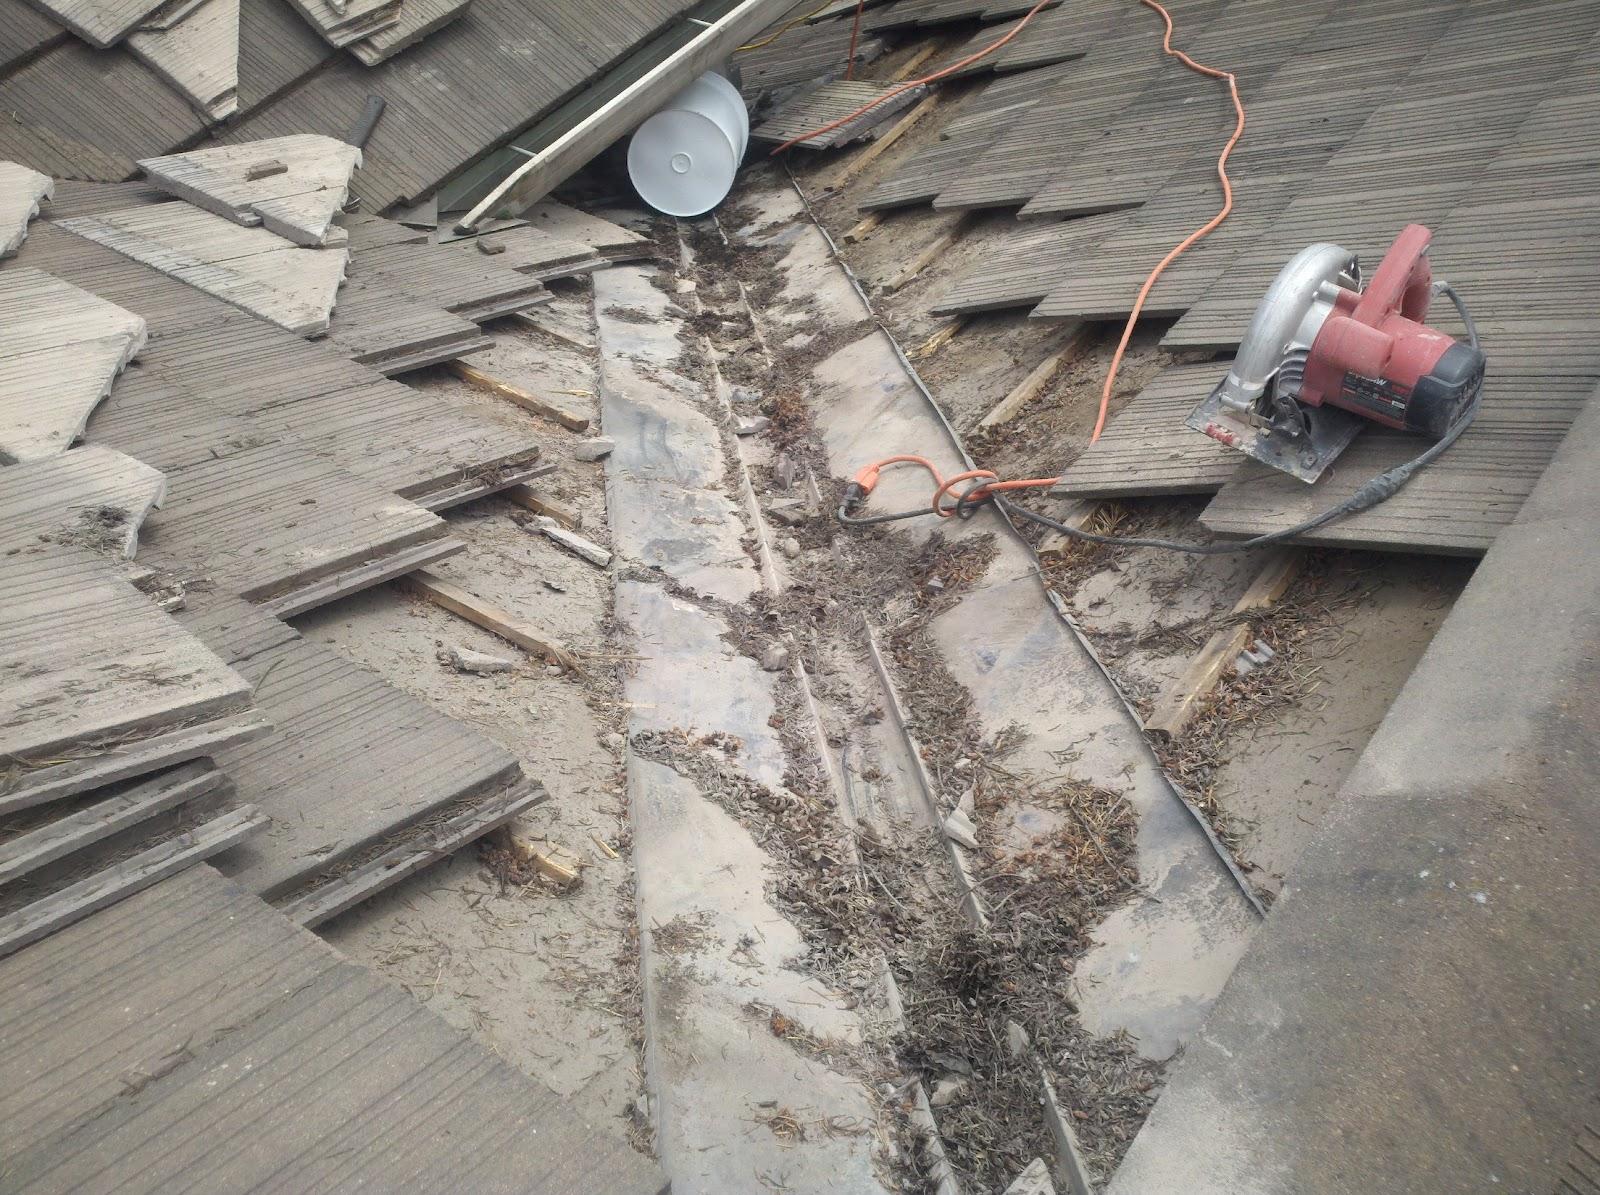 Debris Buildup Under Tiles On Valley Metal.